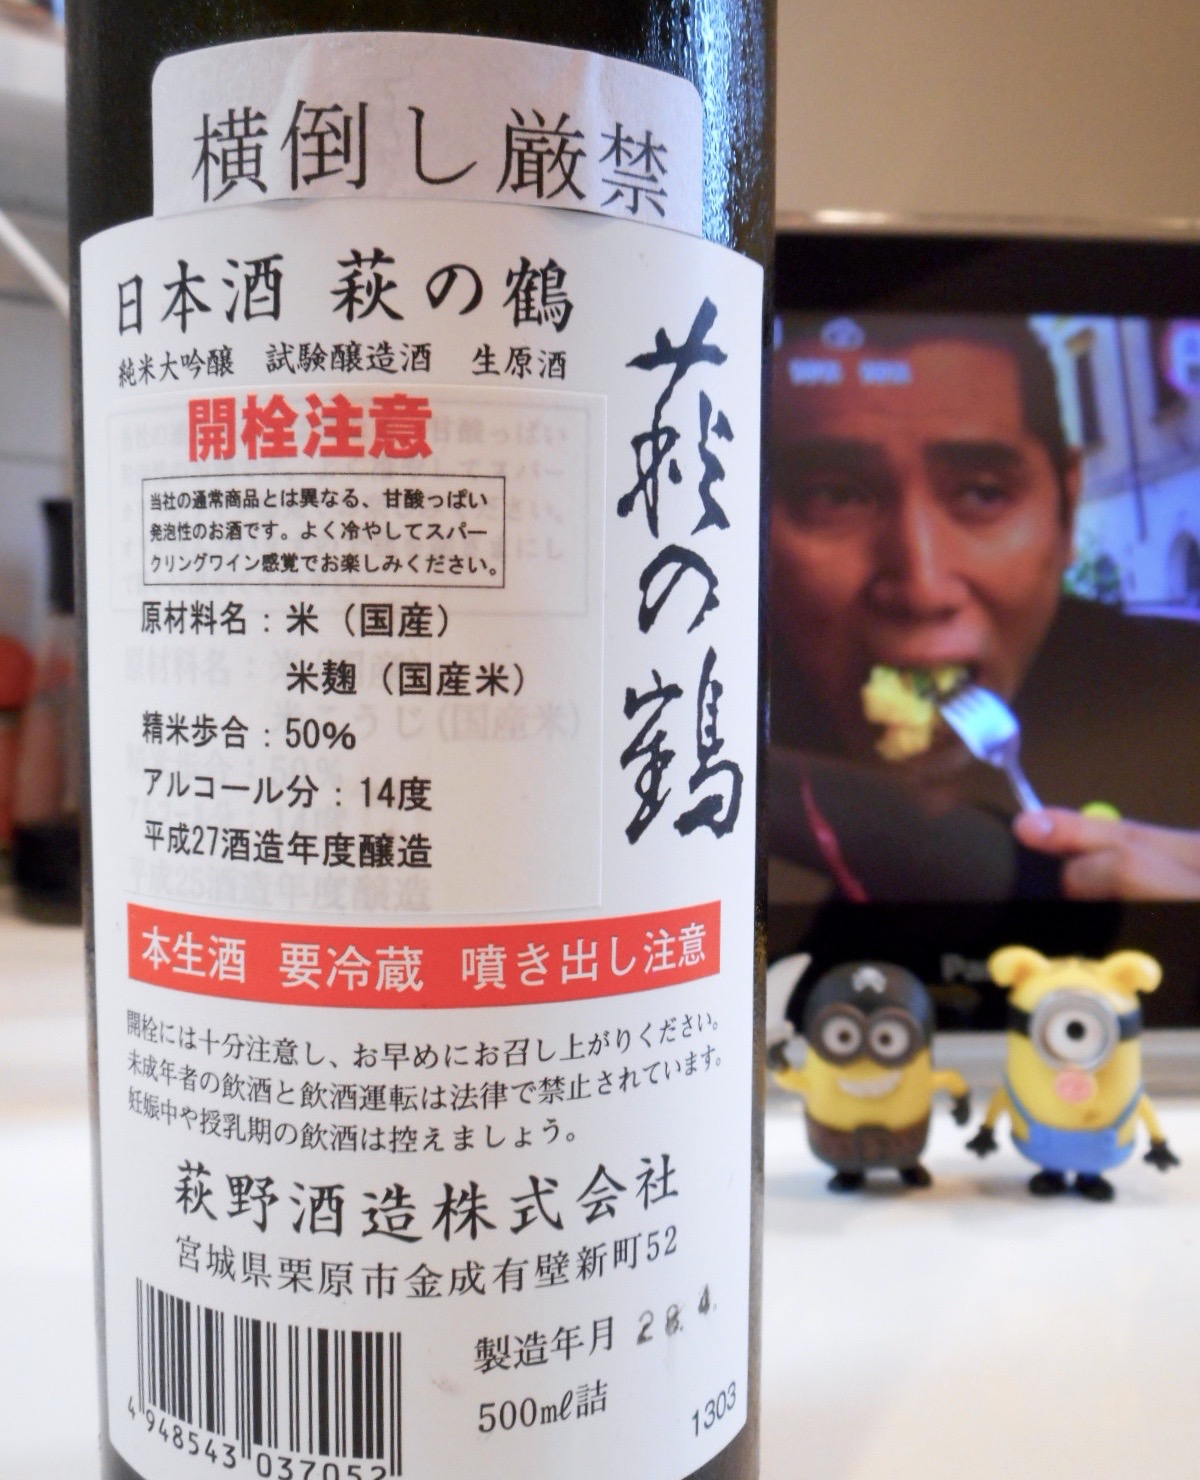 haginotsuru_champagne27by4.jpg